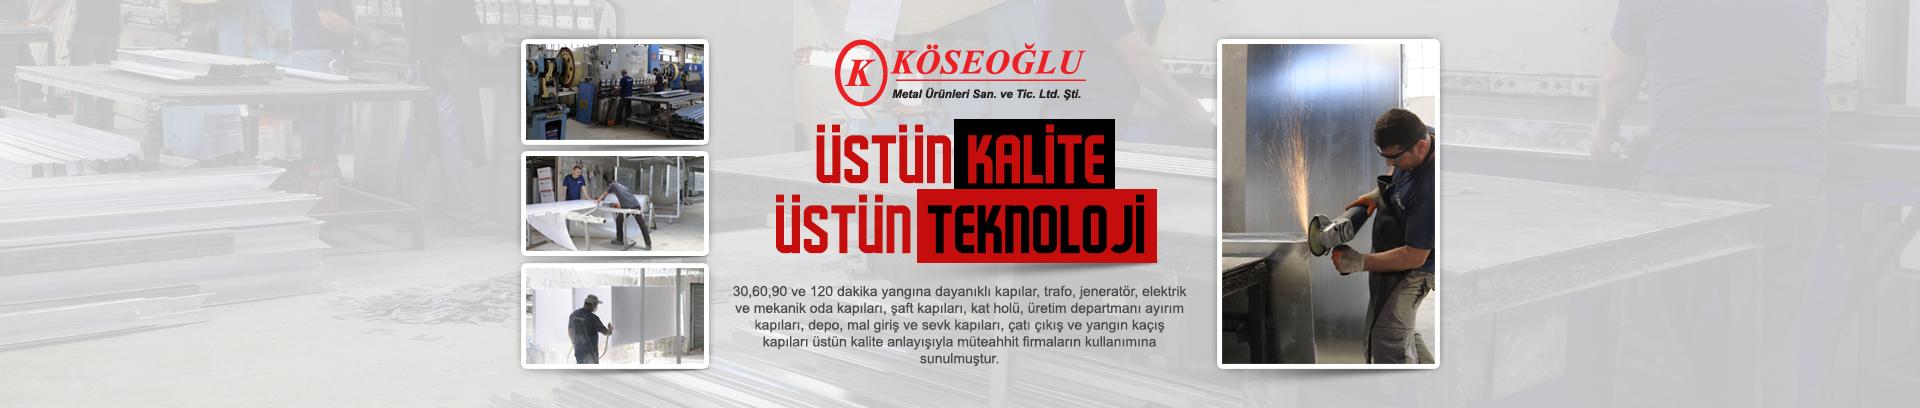 koseoglu-slide03